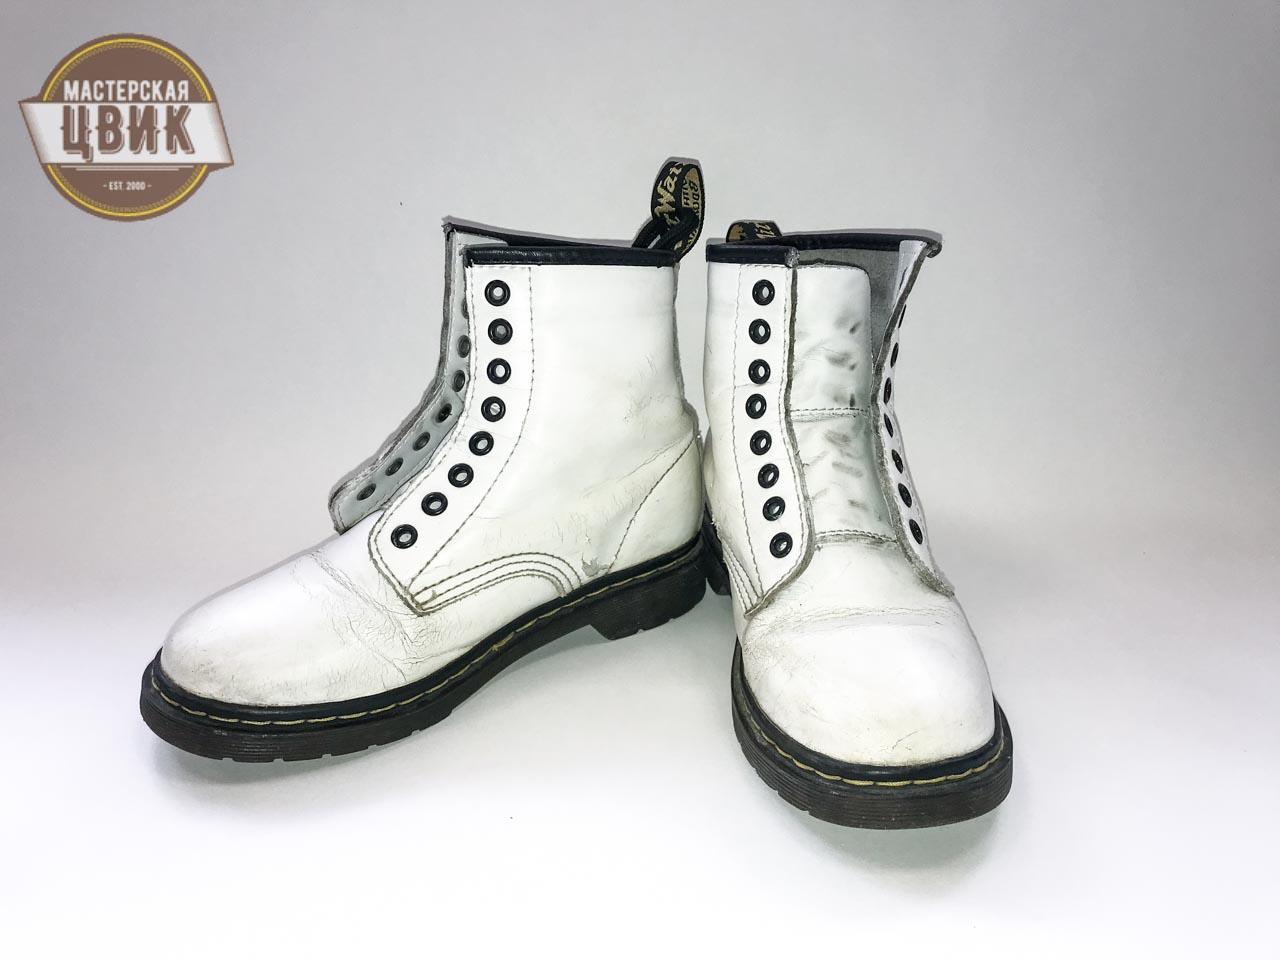 individualnyj-poshiv-obuvi-minsk-25 Индивидуальный пошив обуви